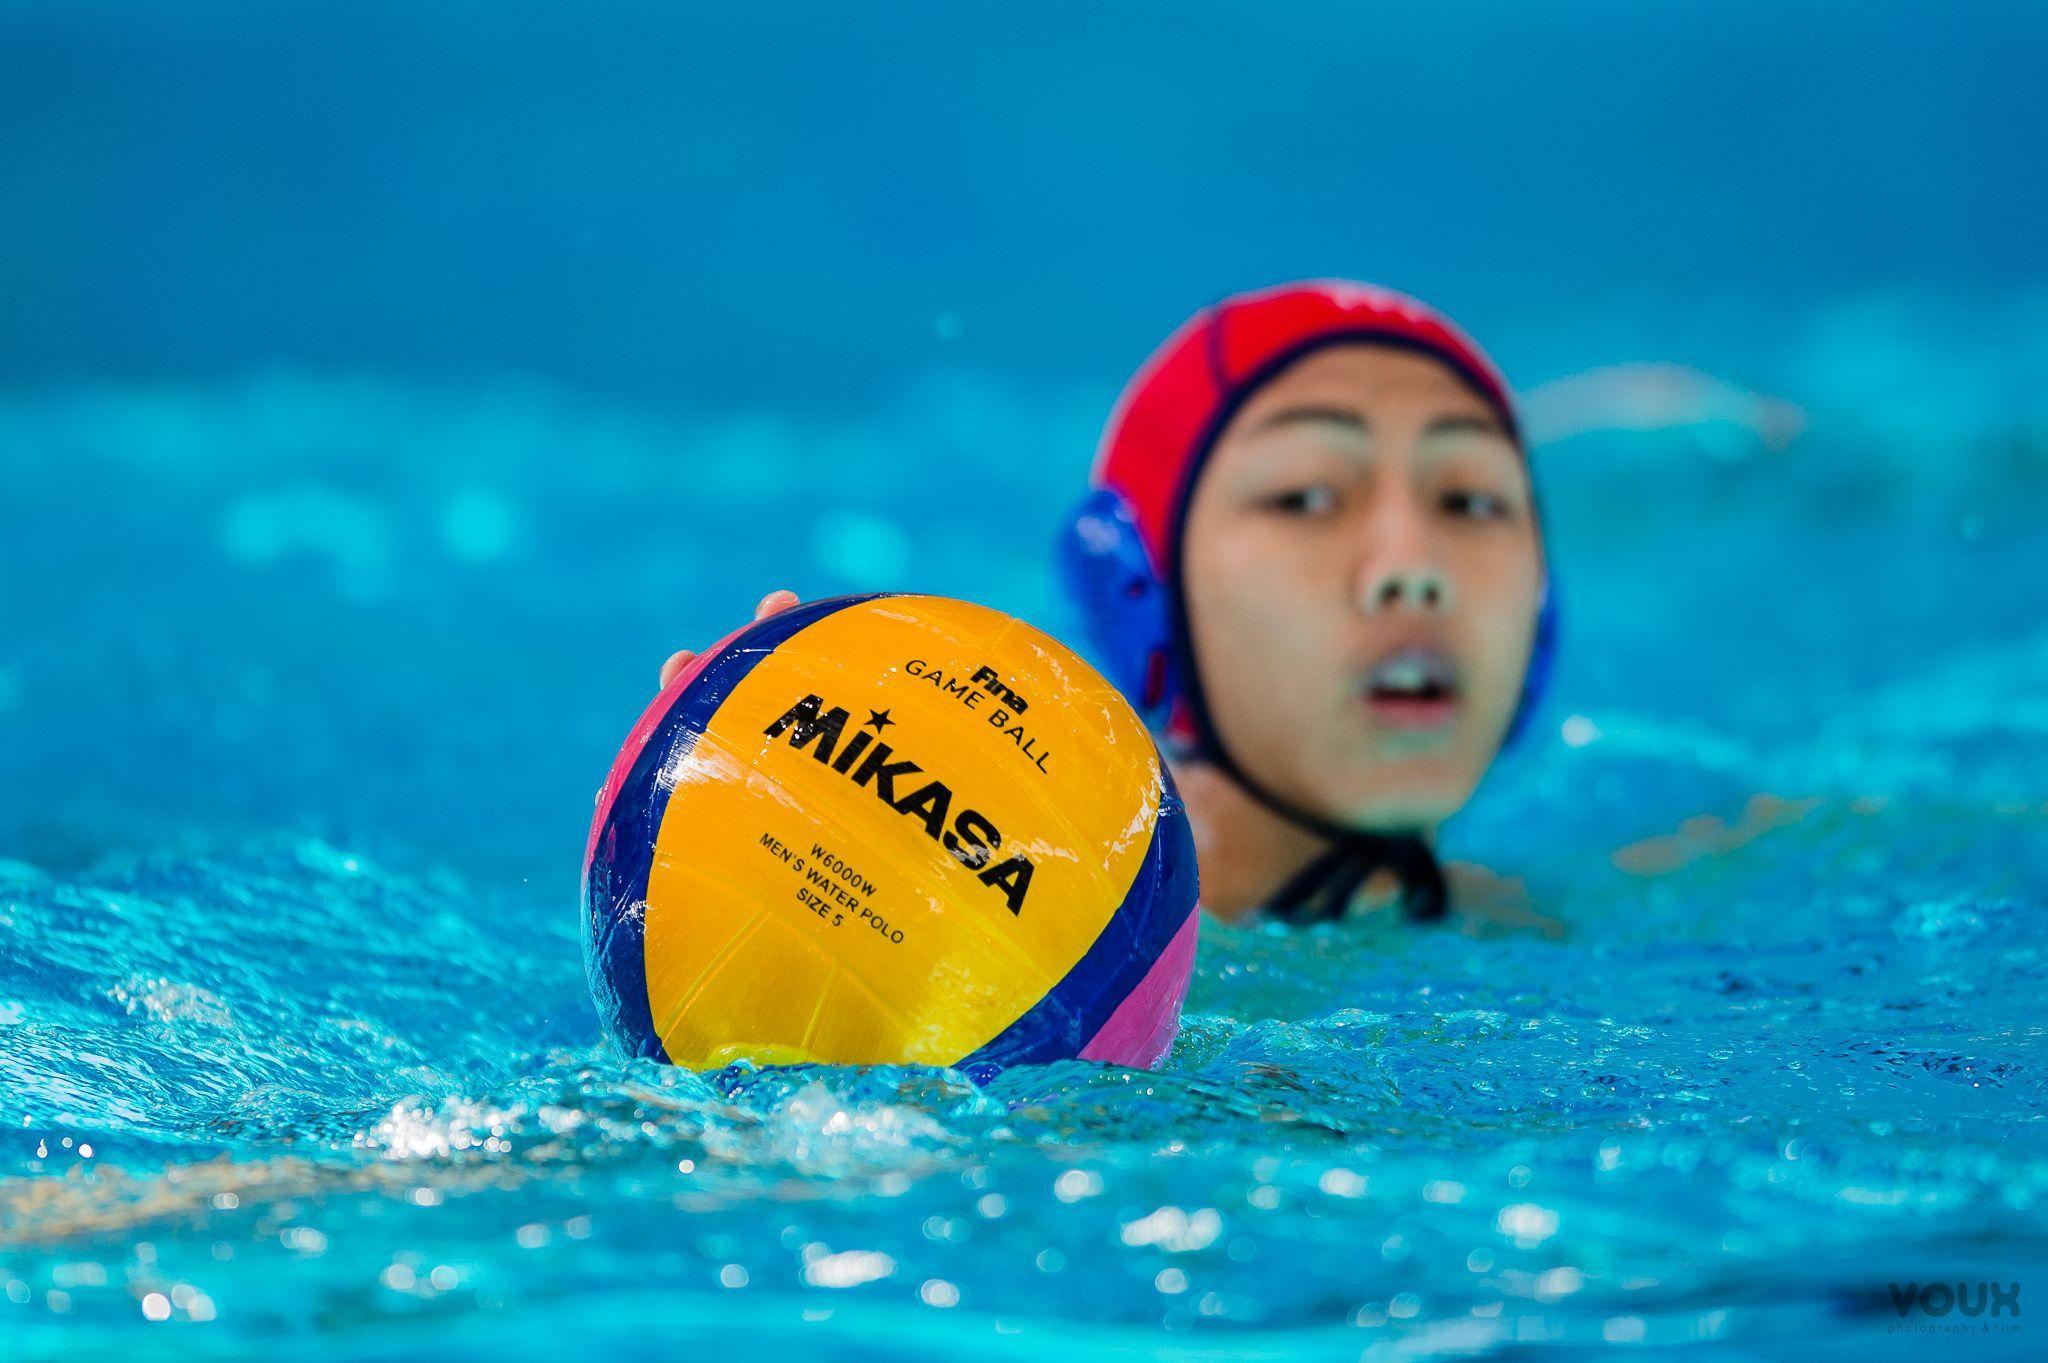 Sea Games 2015 Water Polo Singapore Sports Photography Water Sports Photography Water Polo Men S Water Polo